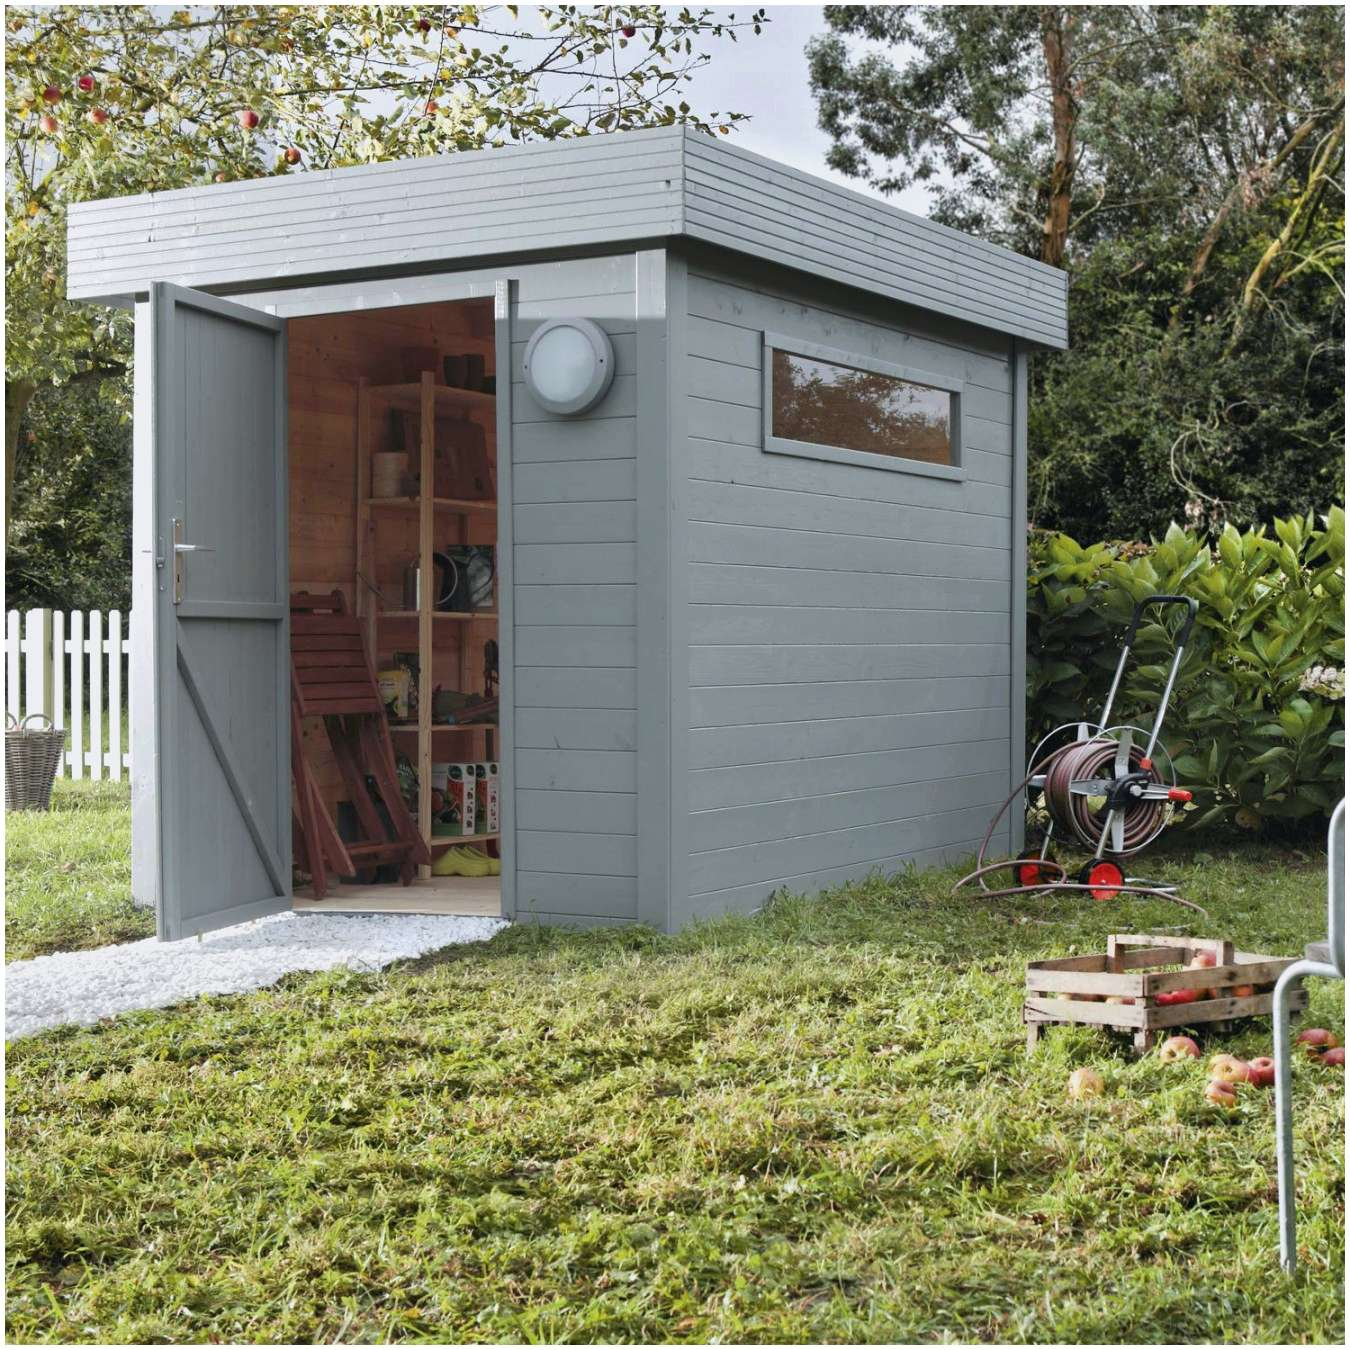 Abri Camping Car Leroy Merlin – Gamboahinestrosa tout Abri Camping Car Leroy Merlin